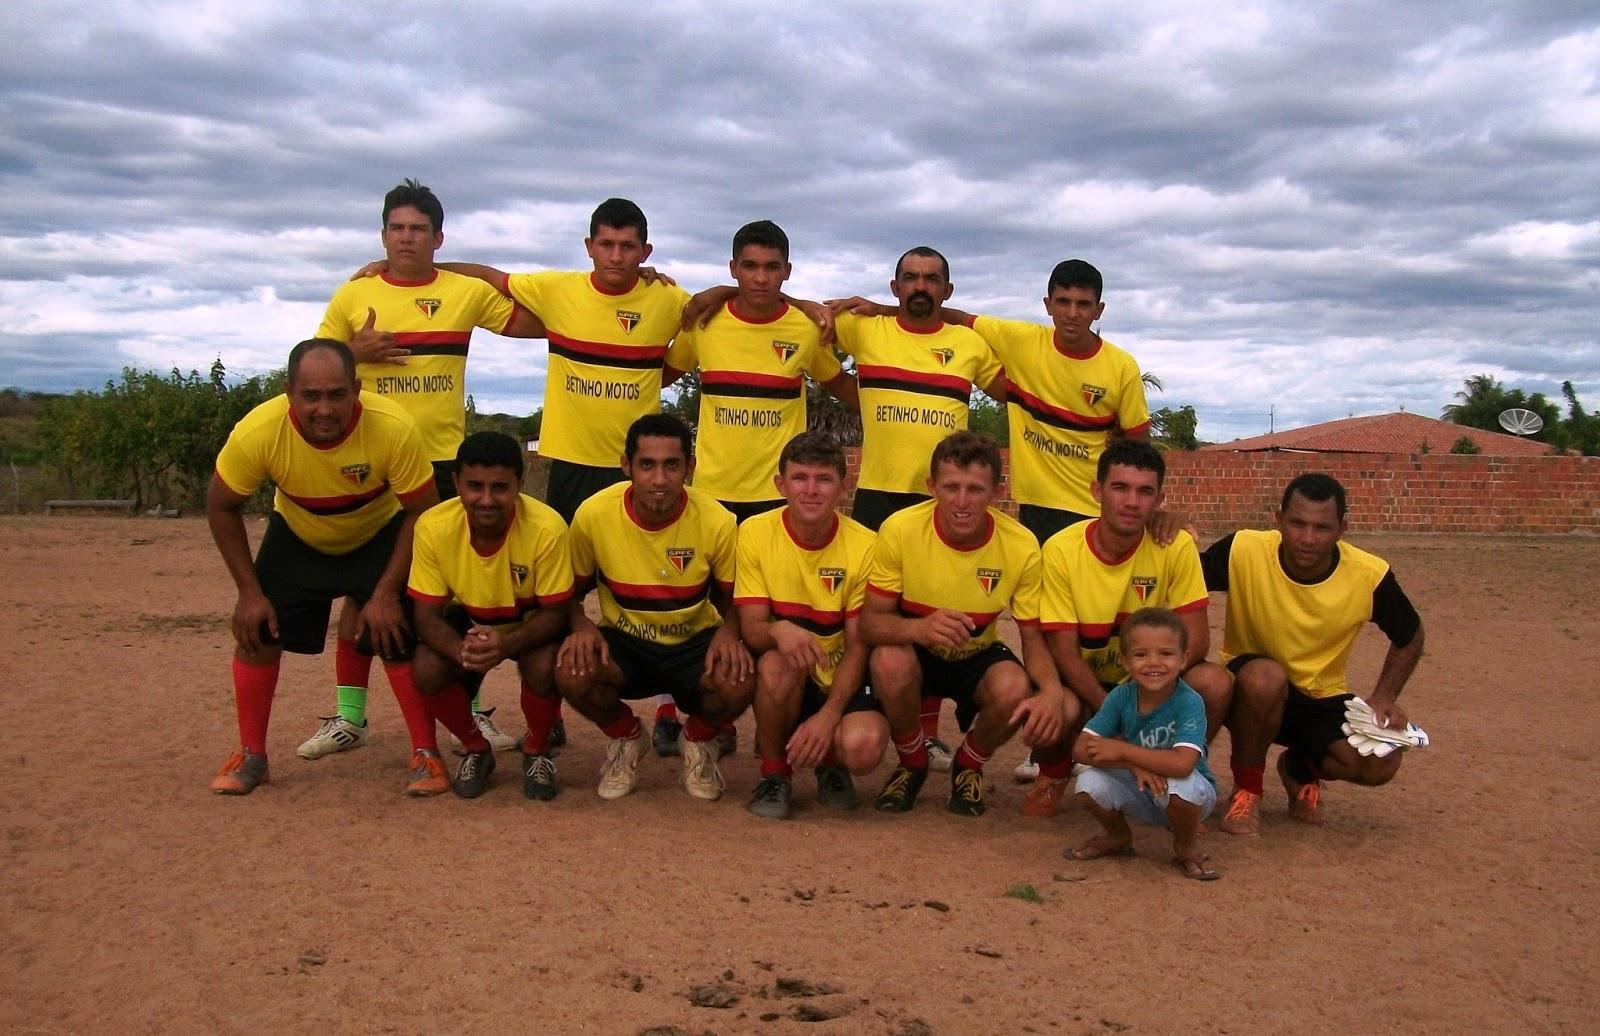 Areias Futebol Clube